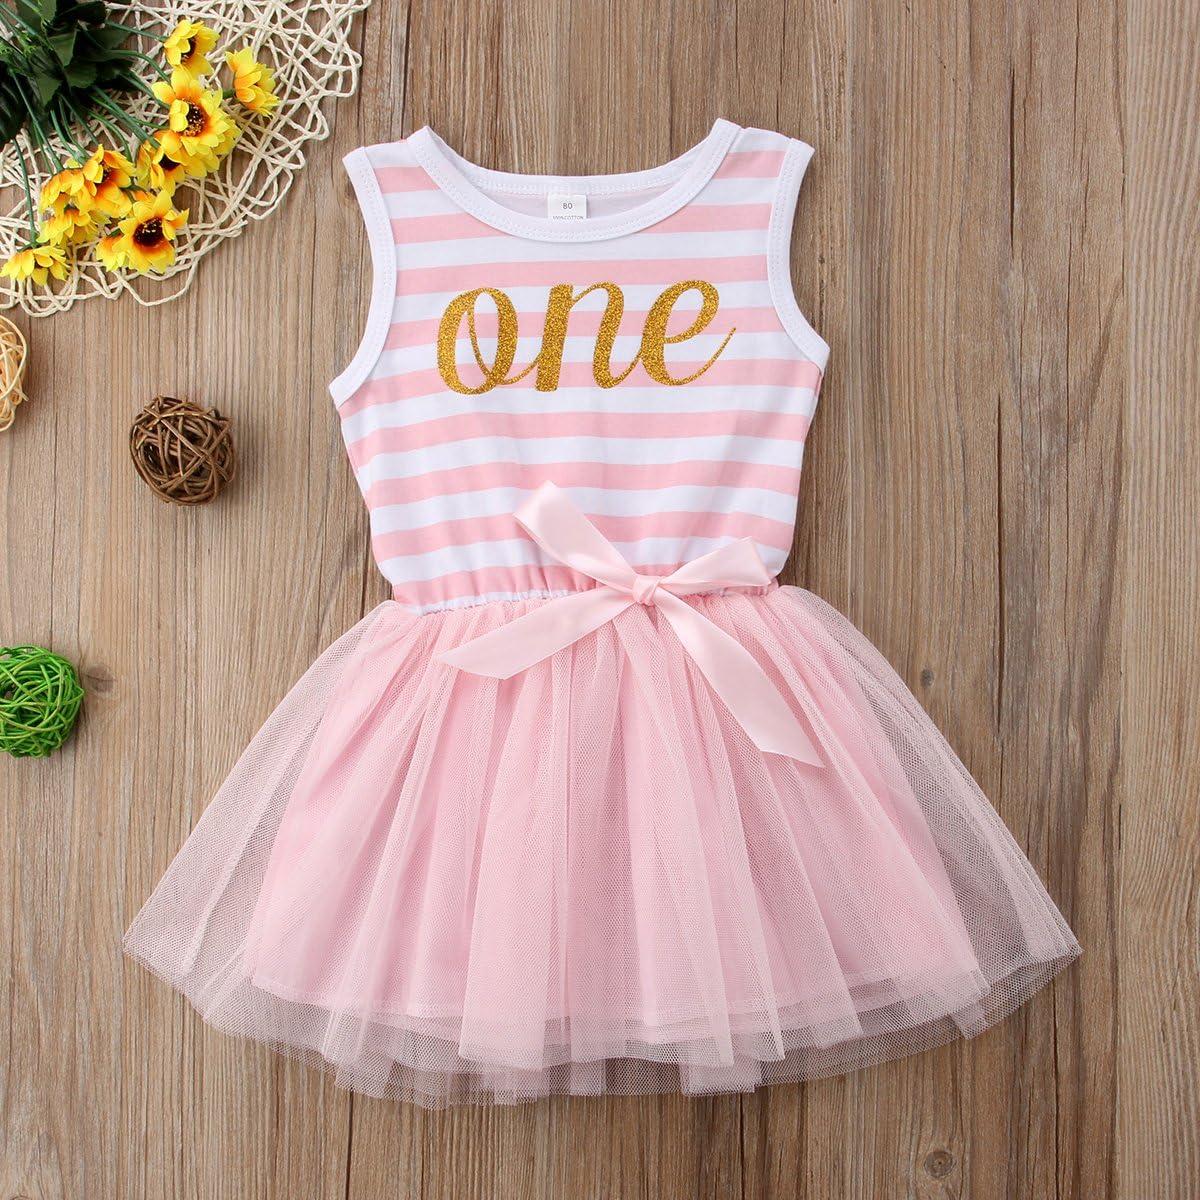 Toddler Little Girls Striped Alphabet Bownot Lace Princess Tutu Dress